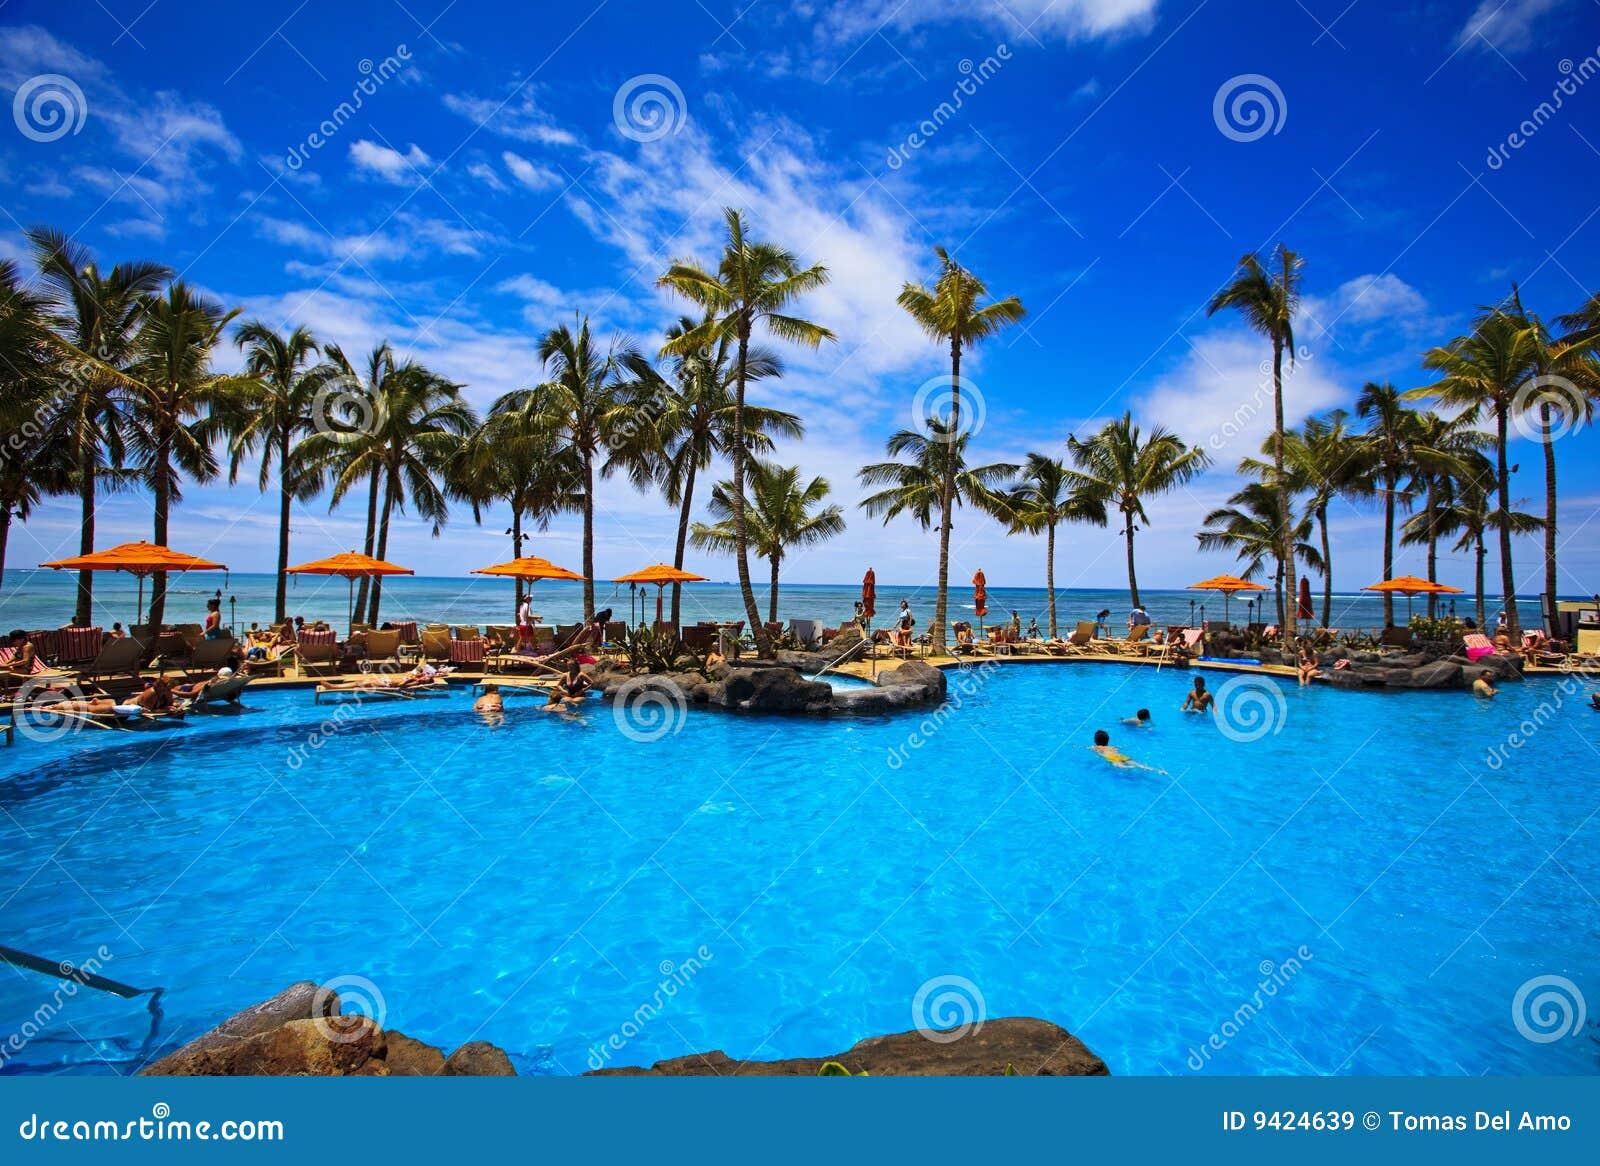 Swimming pool on waikiki beach hawaii royalty free stock for Pool design honolulu